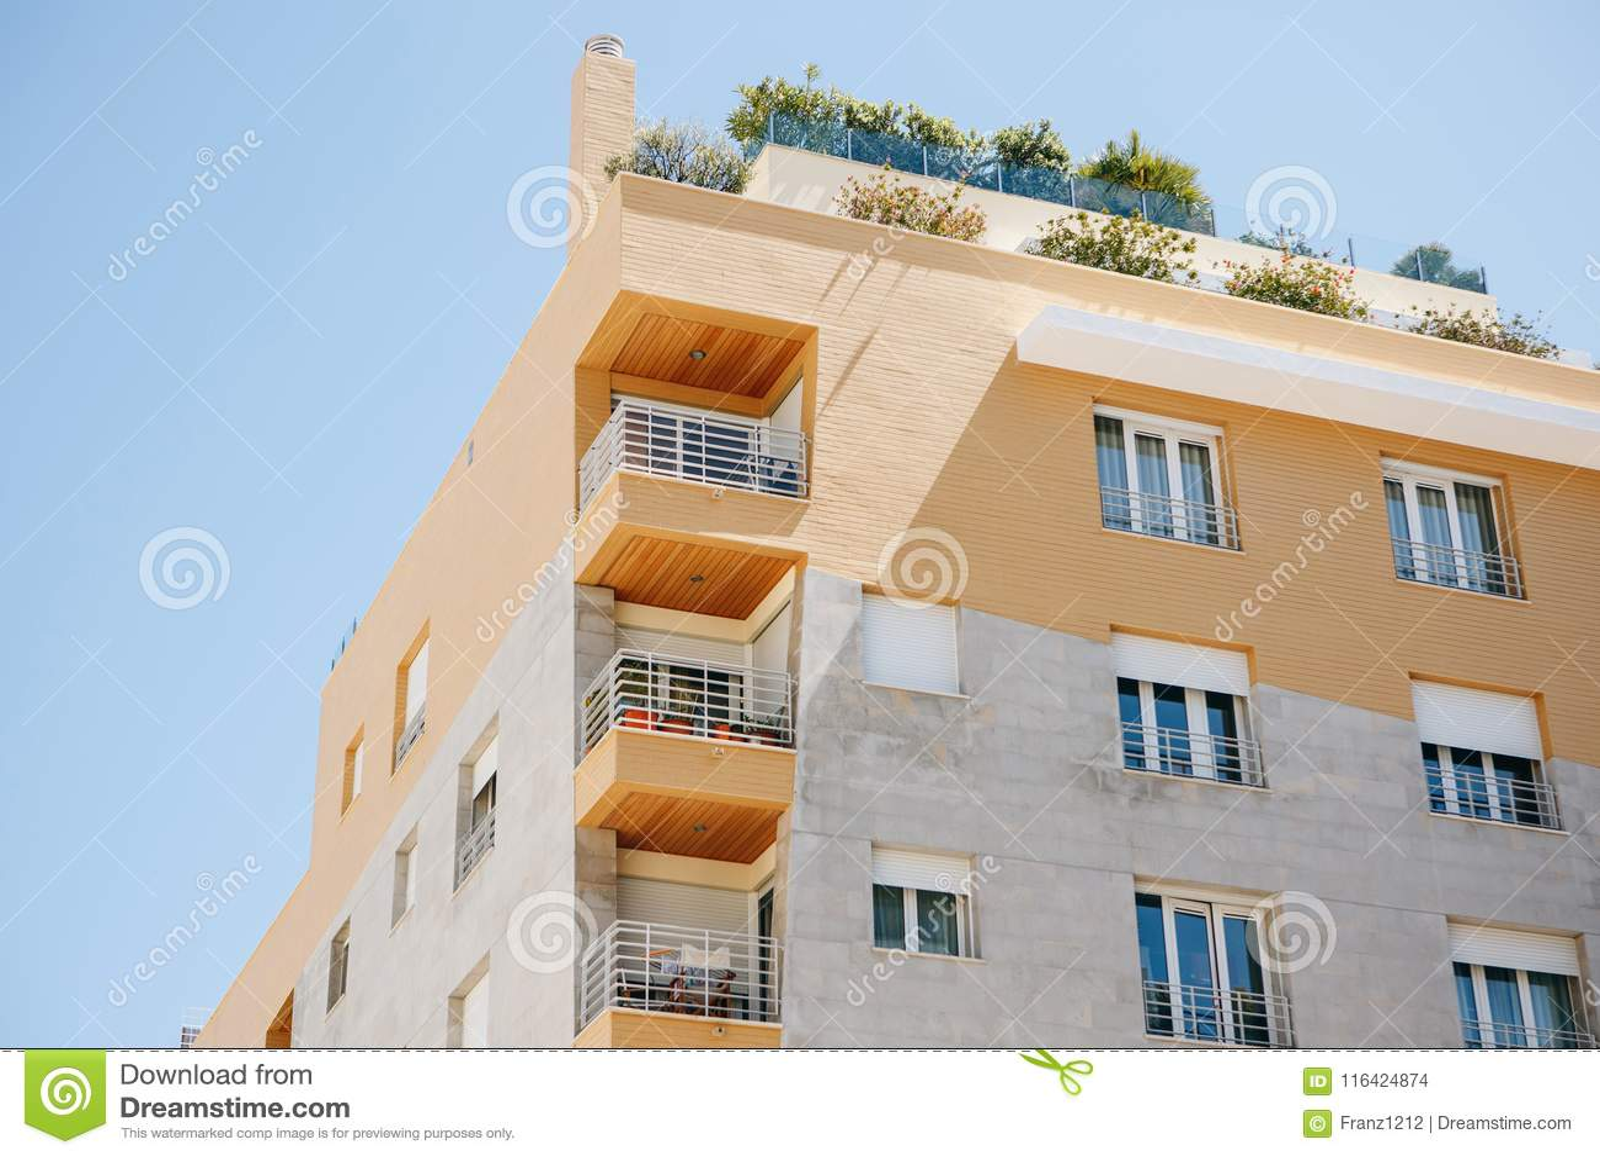 Woningbouw met balkons in Lissabon in Portugal Europese Huisvesting